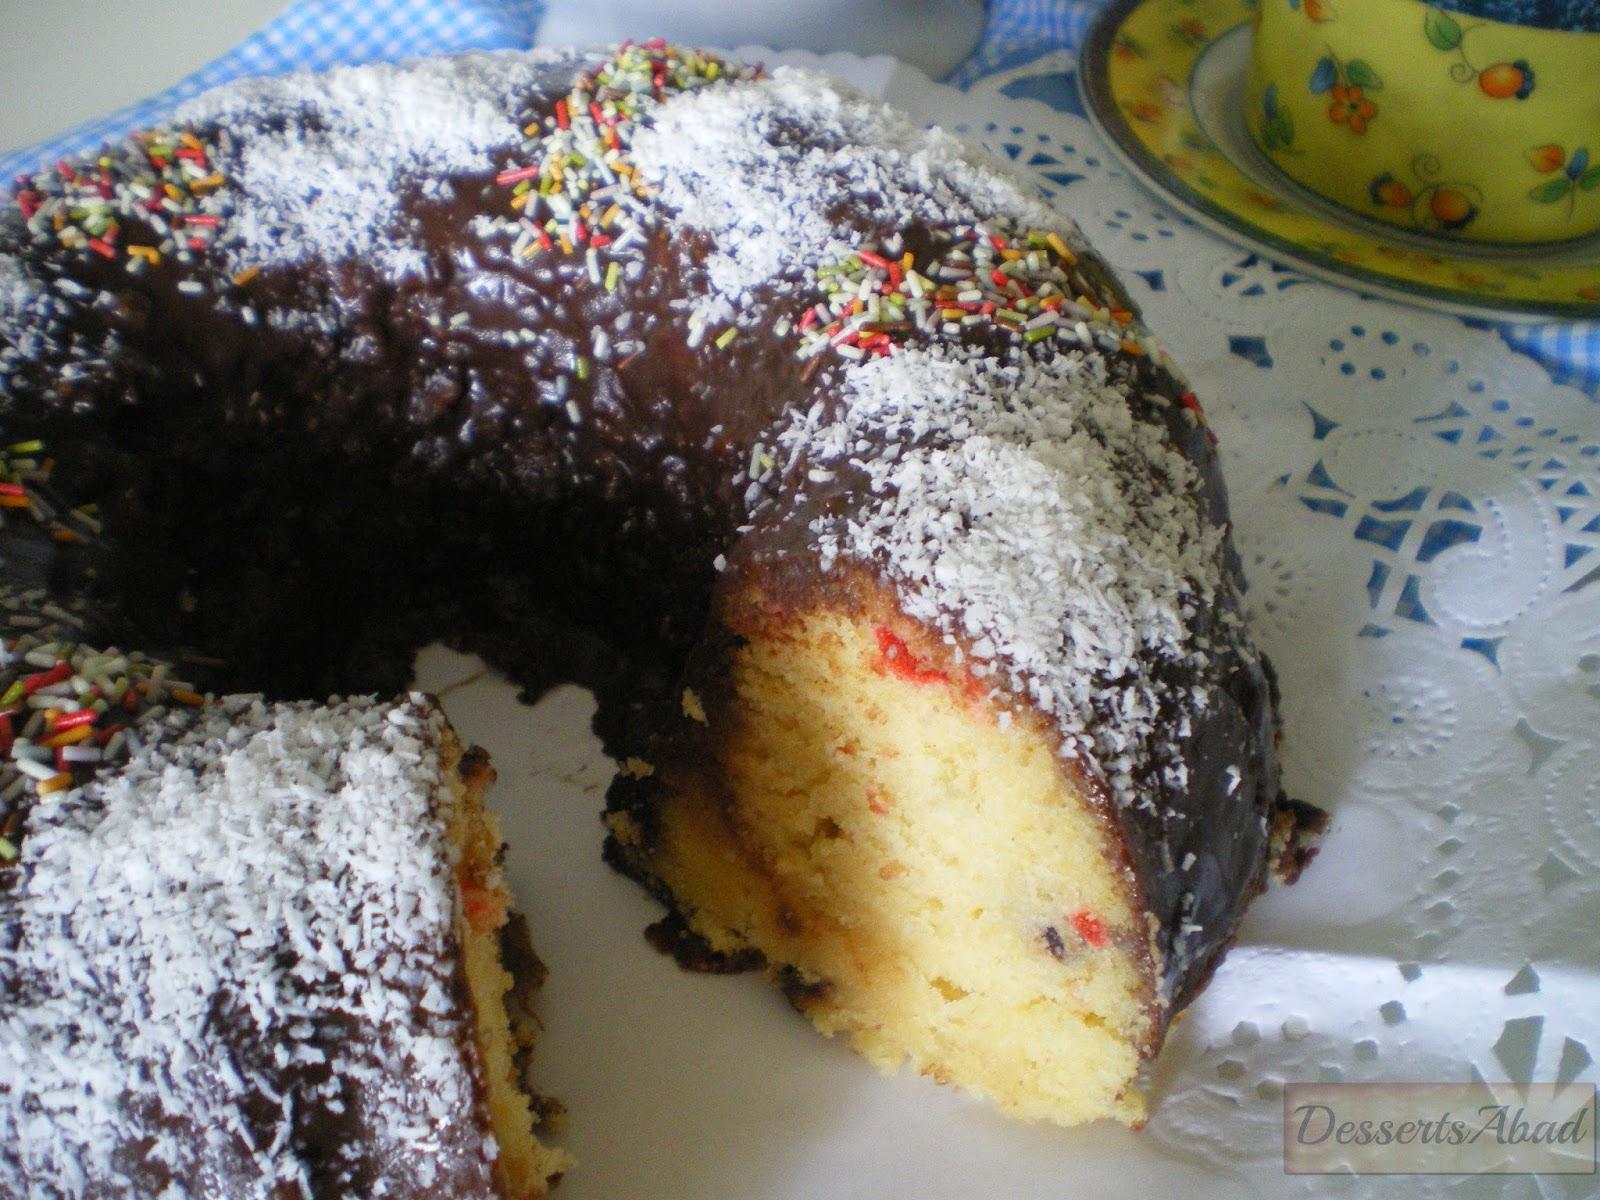 Corona de chocolate con guindas y pasas al kirsch